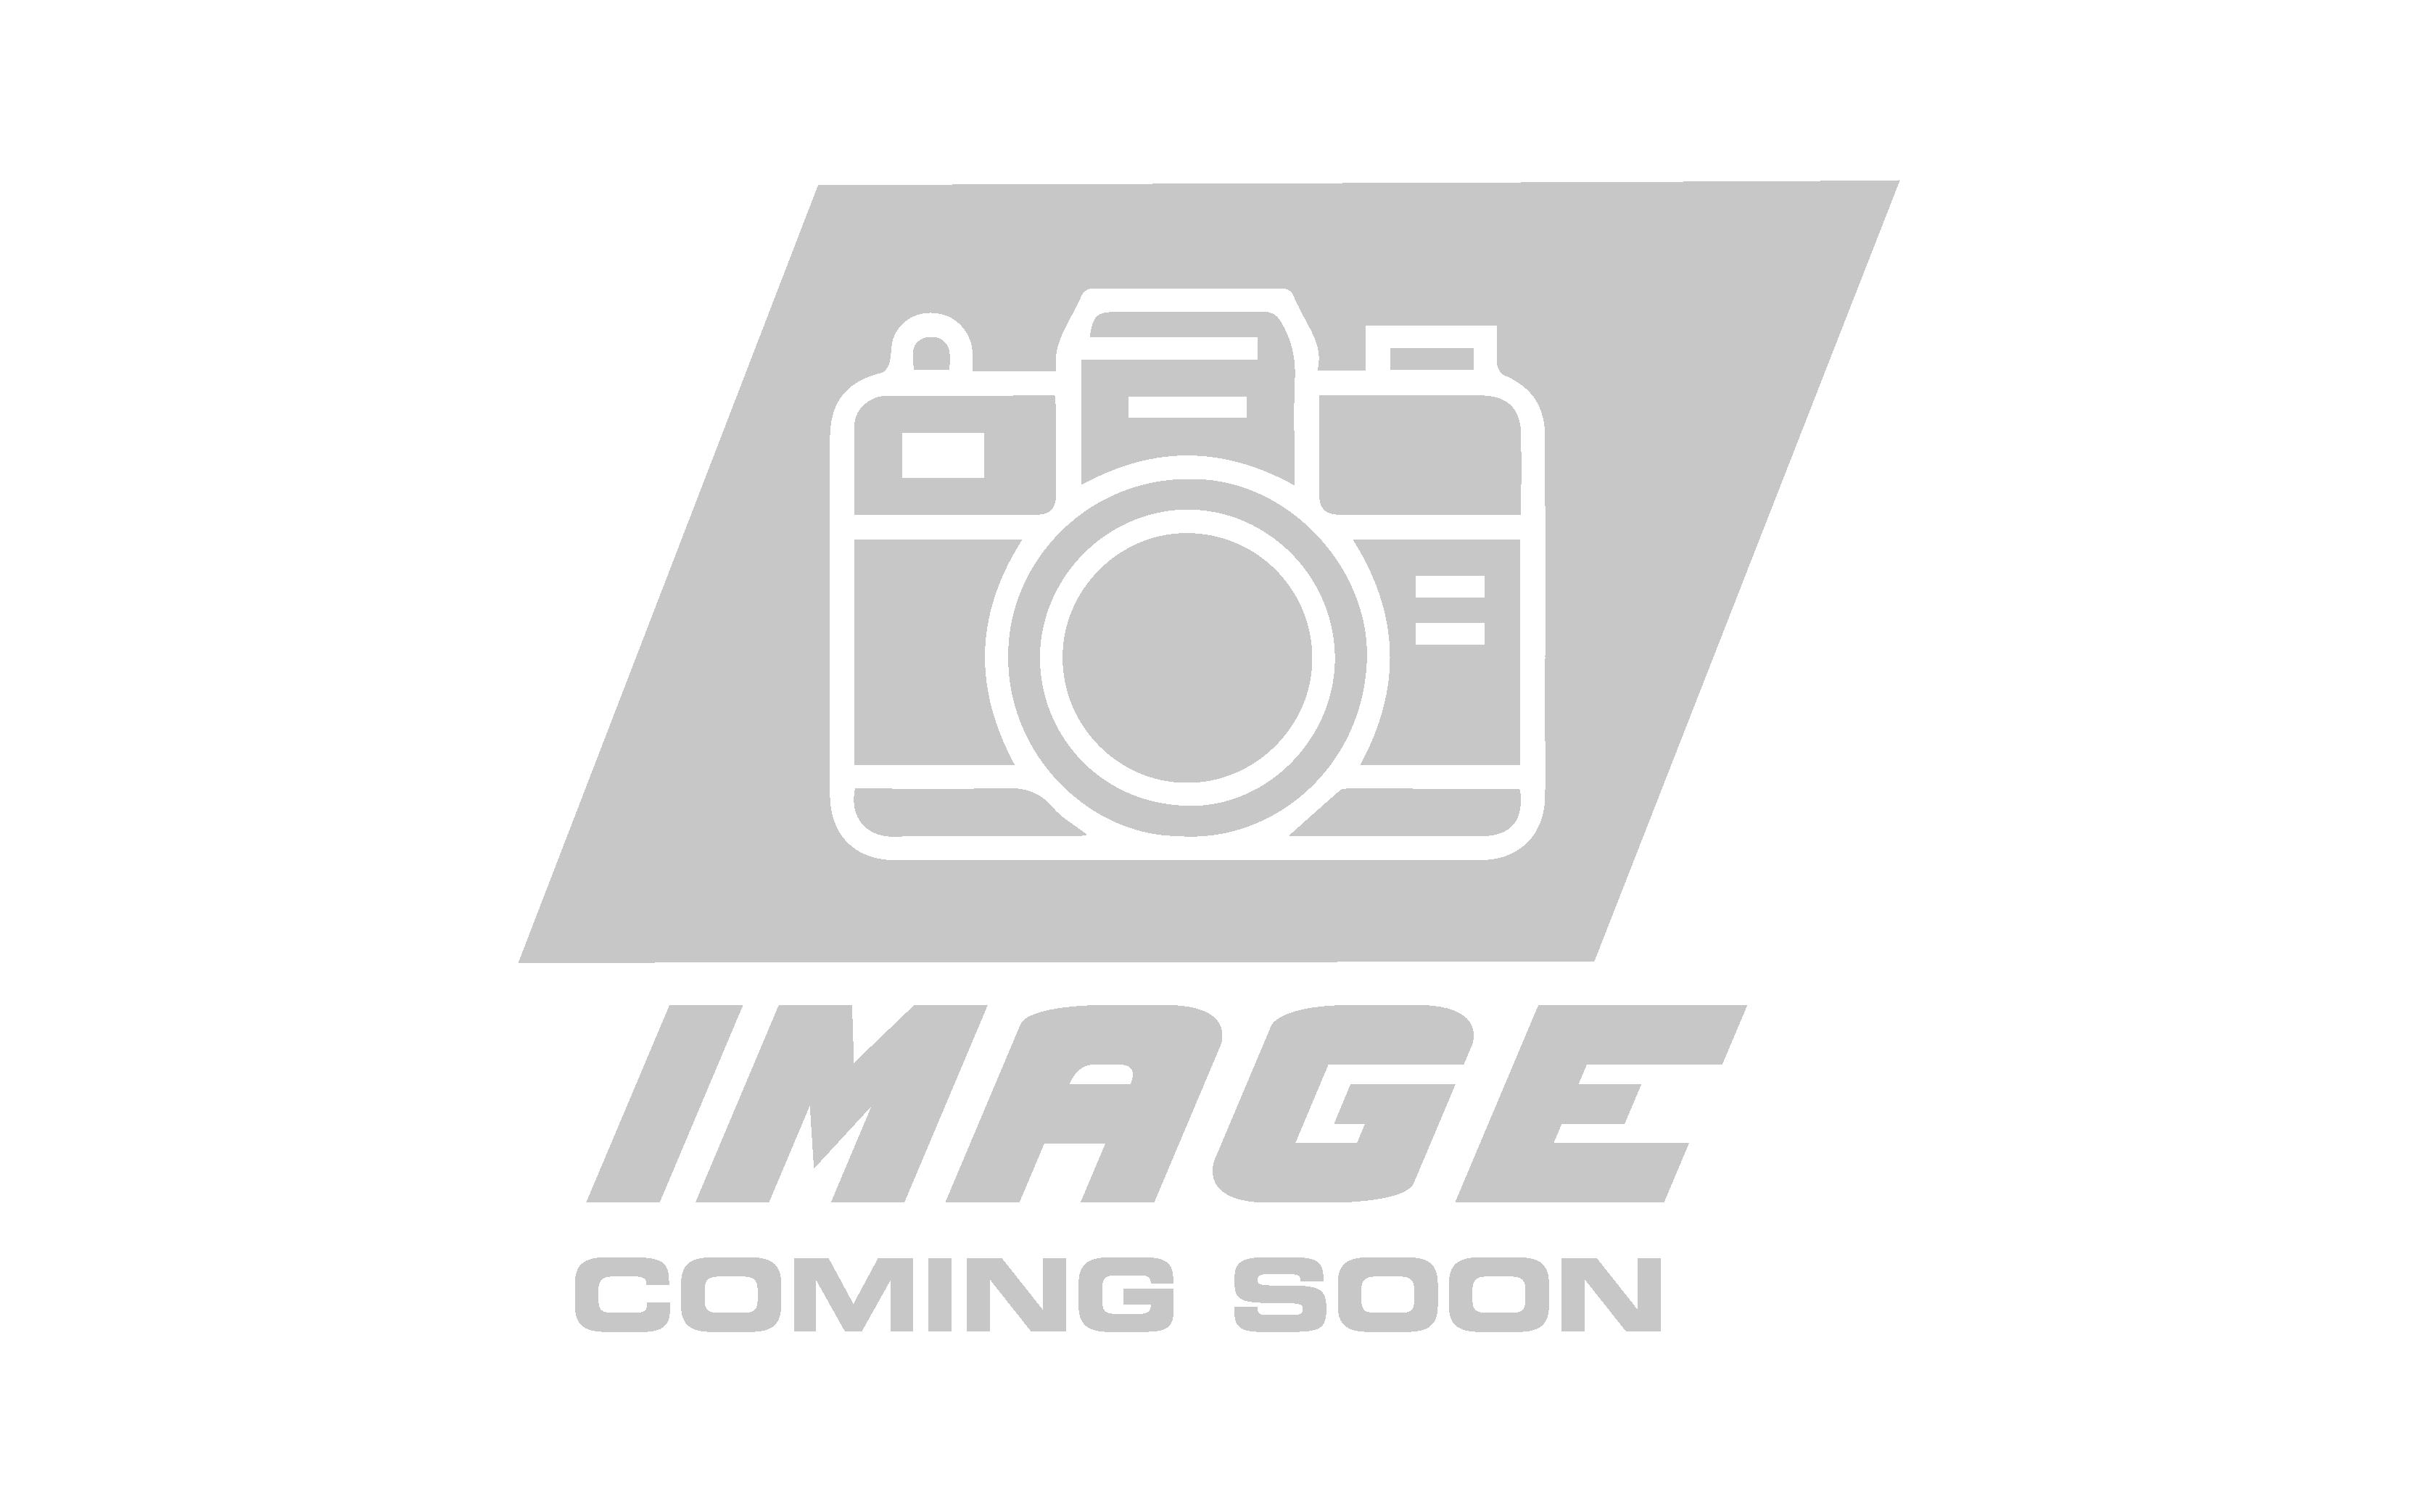 dodge_ram_1500_4th_gen_air_lift_1000_series_rear_kit_60818